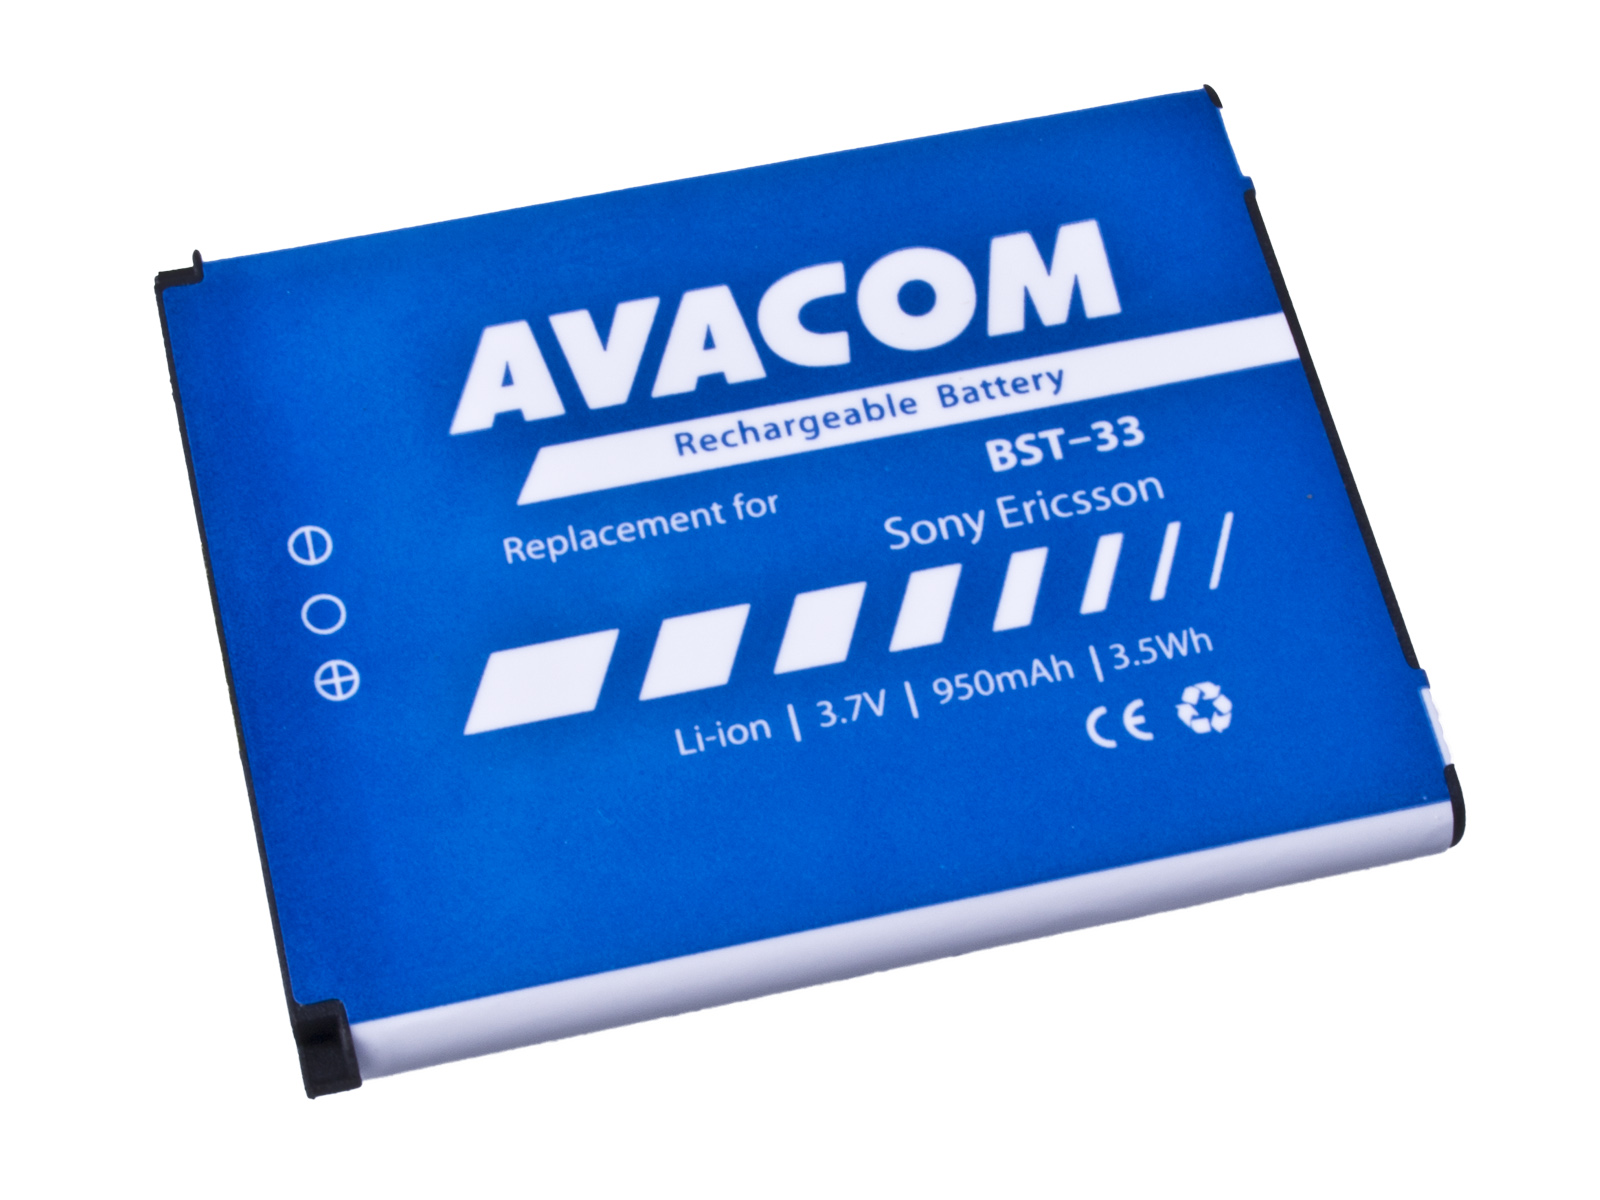 Baterie AVACOM GSSE-W900-S950A do mobilu Sony Ericsson K550i, K800, W900i Li-Ion 3,7V 950mAh (náhrad